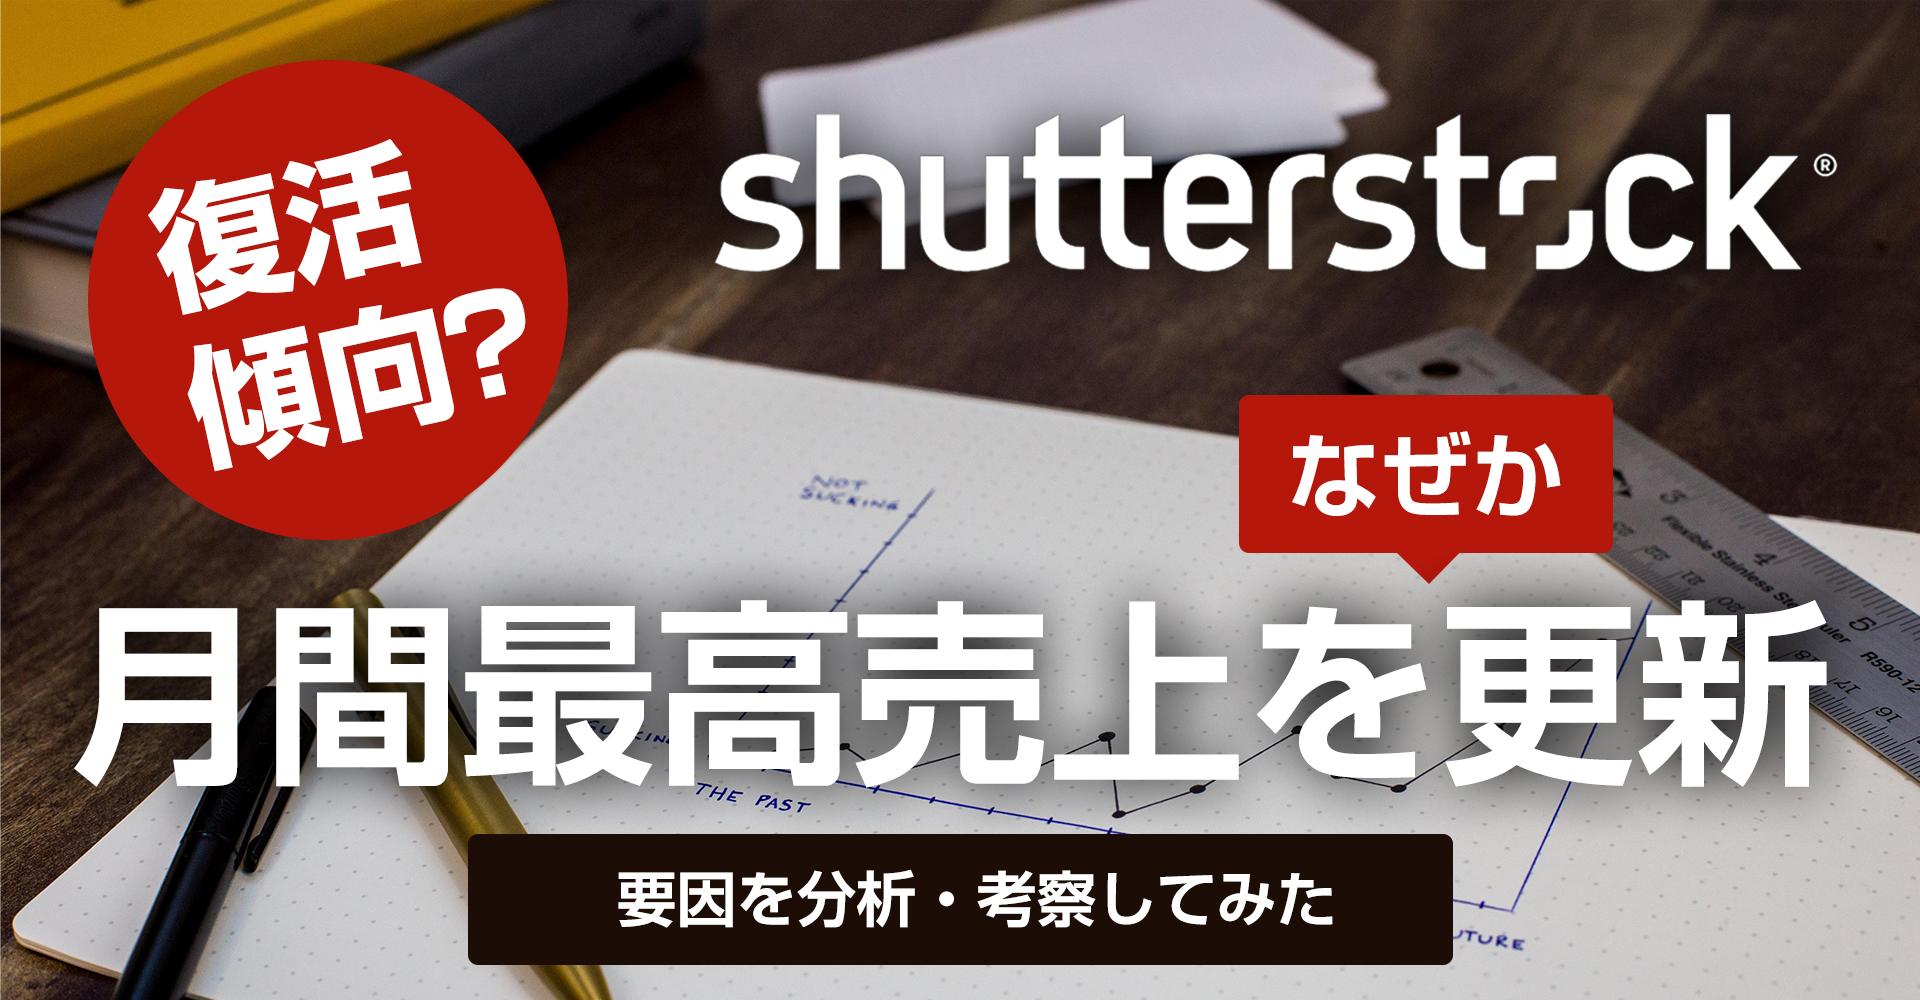 Shutterstock売上更新のなぜ?を分析してみた